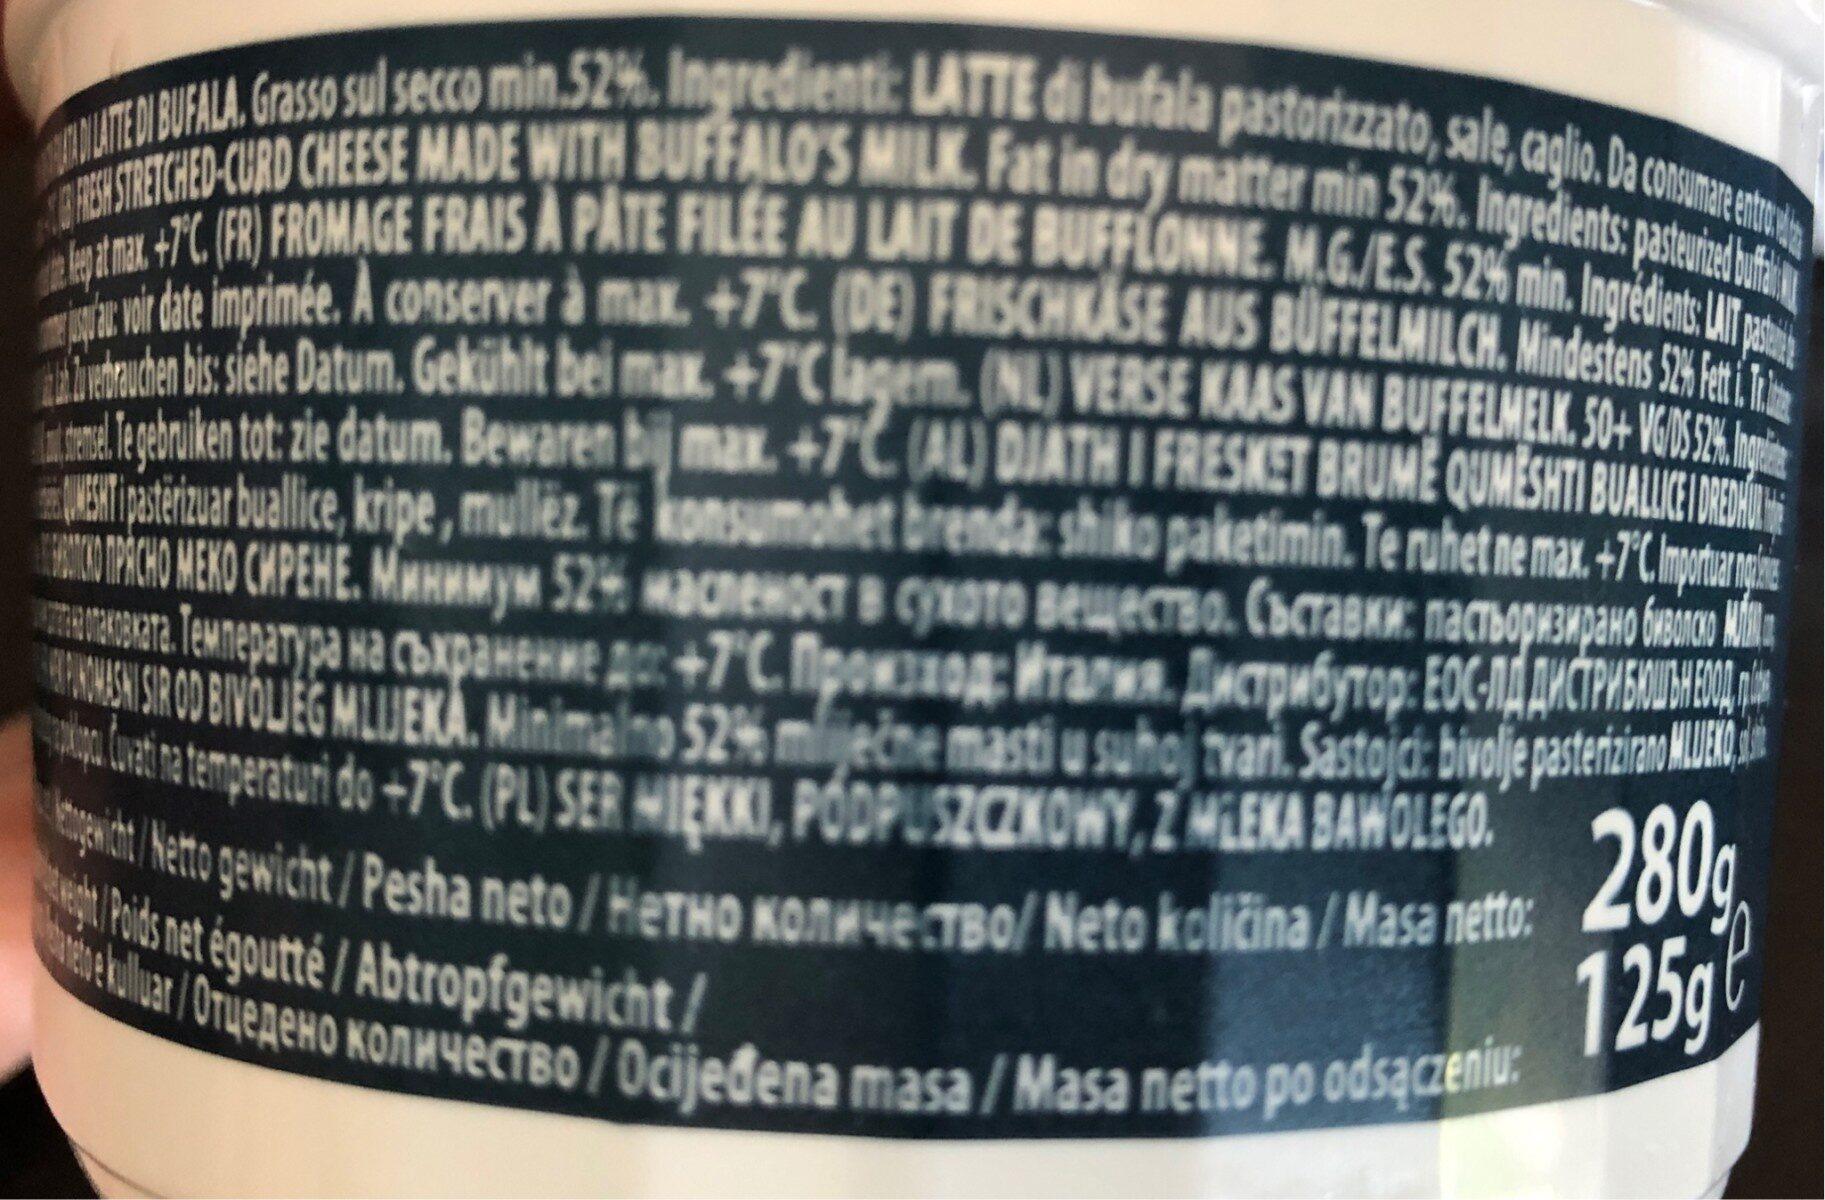 Zanetti Fresh Mozarella Cheese Buffalo Cup (125 G) - Ingrédients - fr